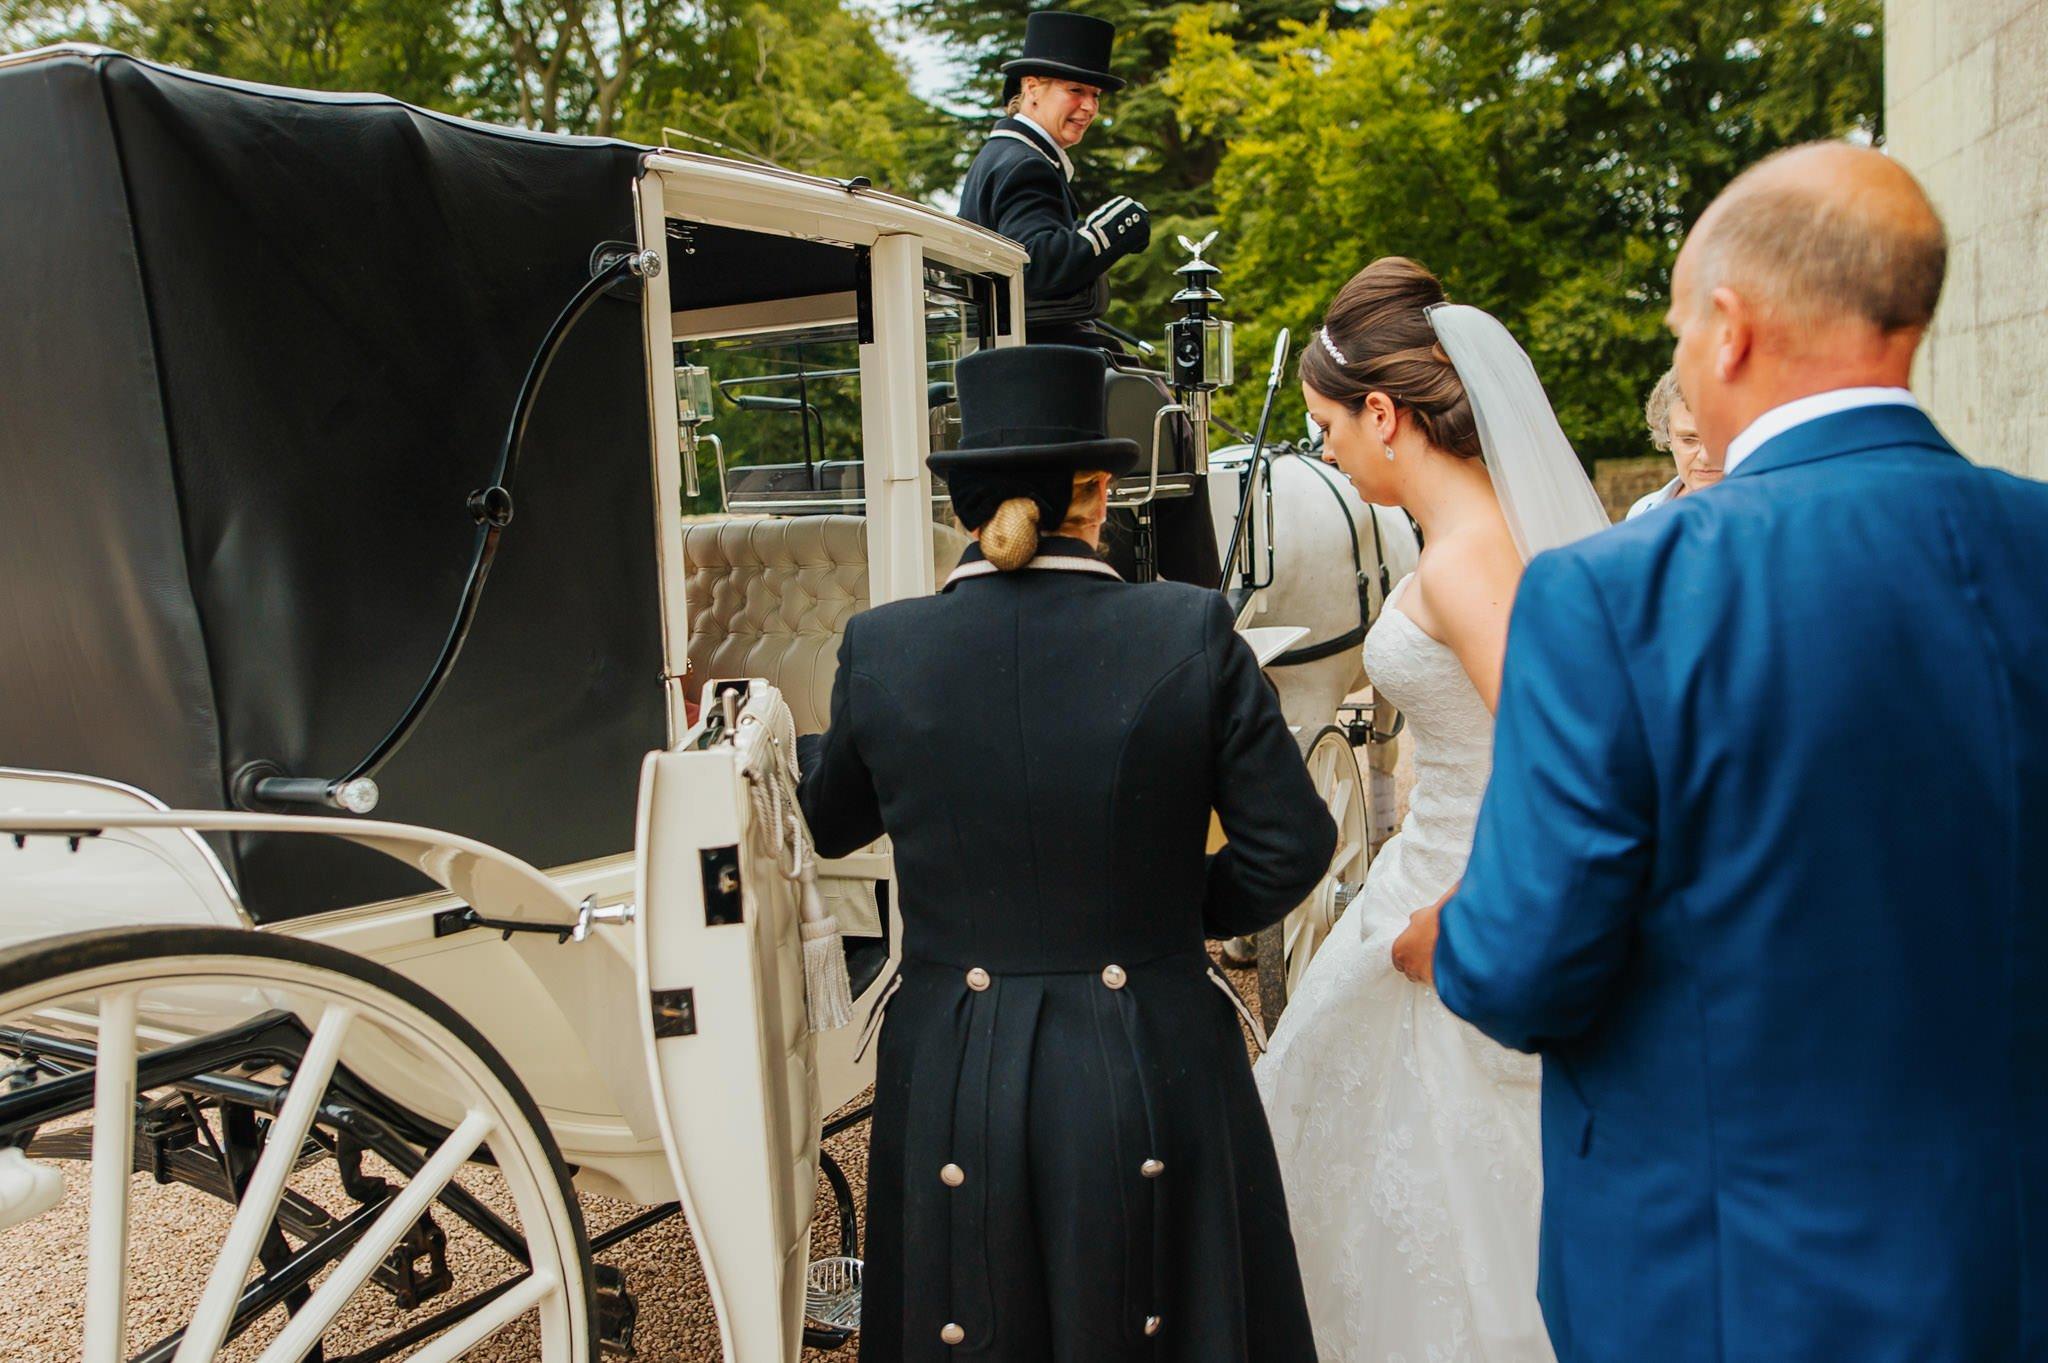 Eastnor Castle wedding photographer Herefordshire, West Midlands - Sarah + Dean 16